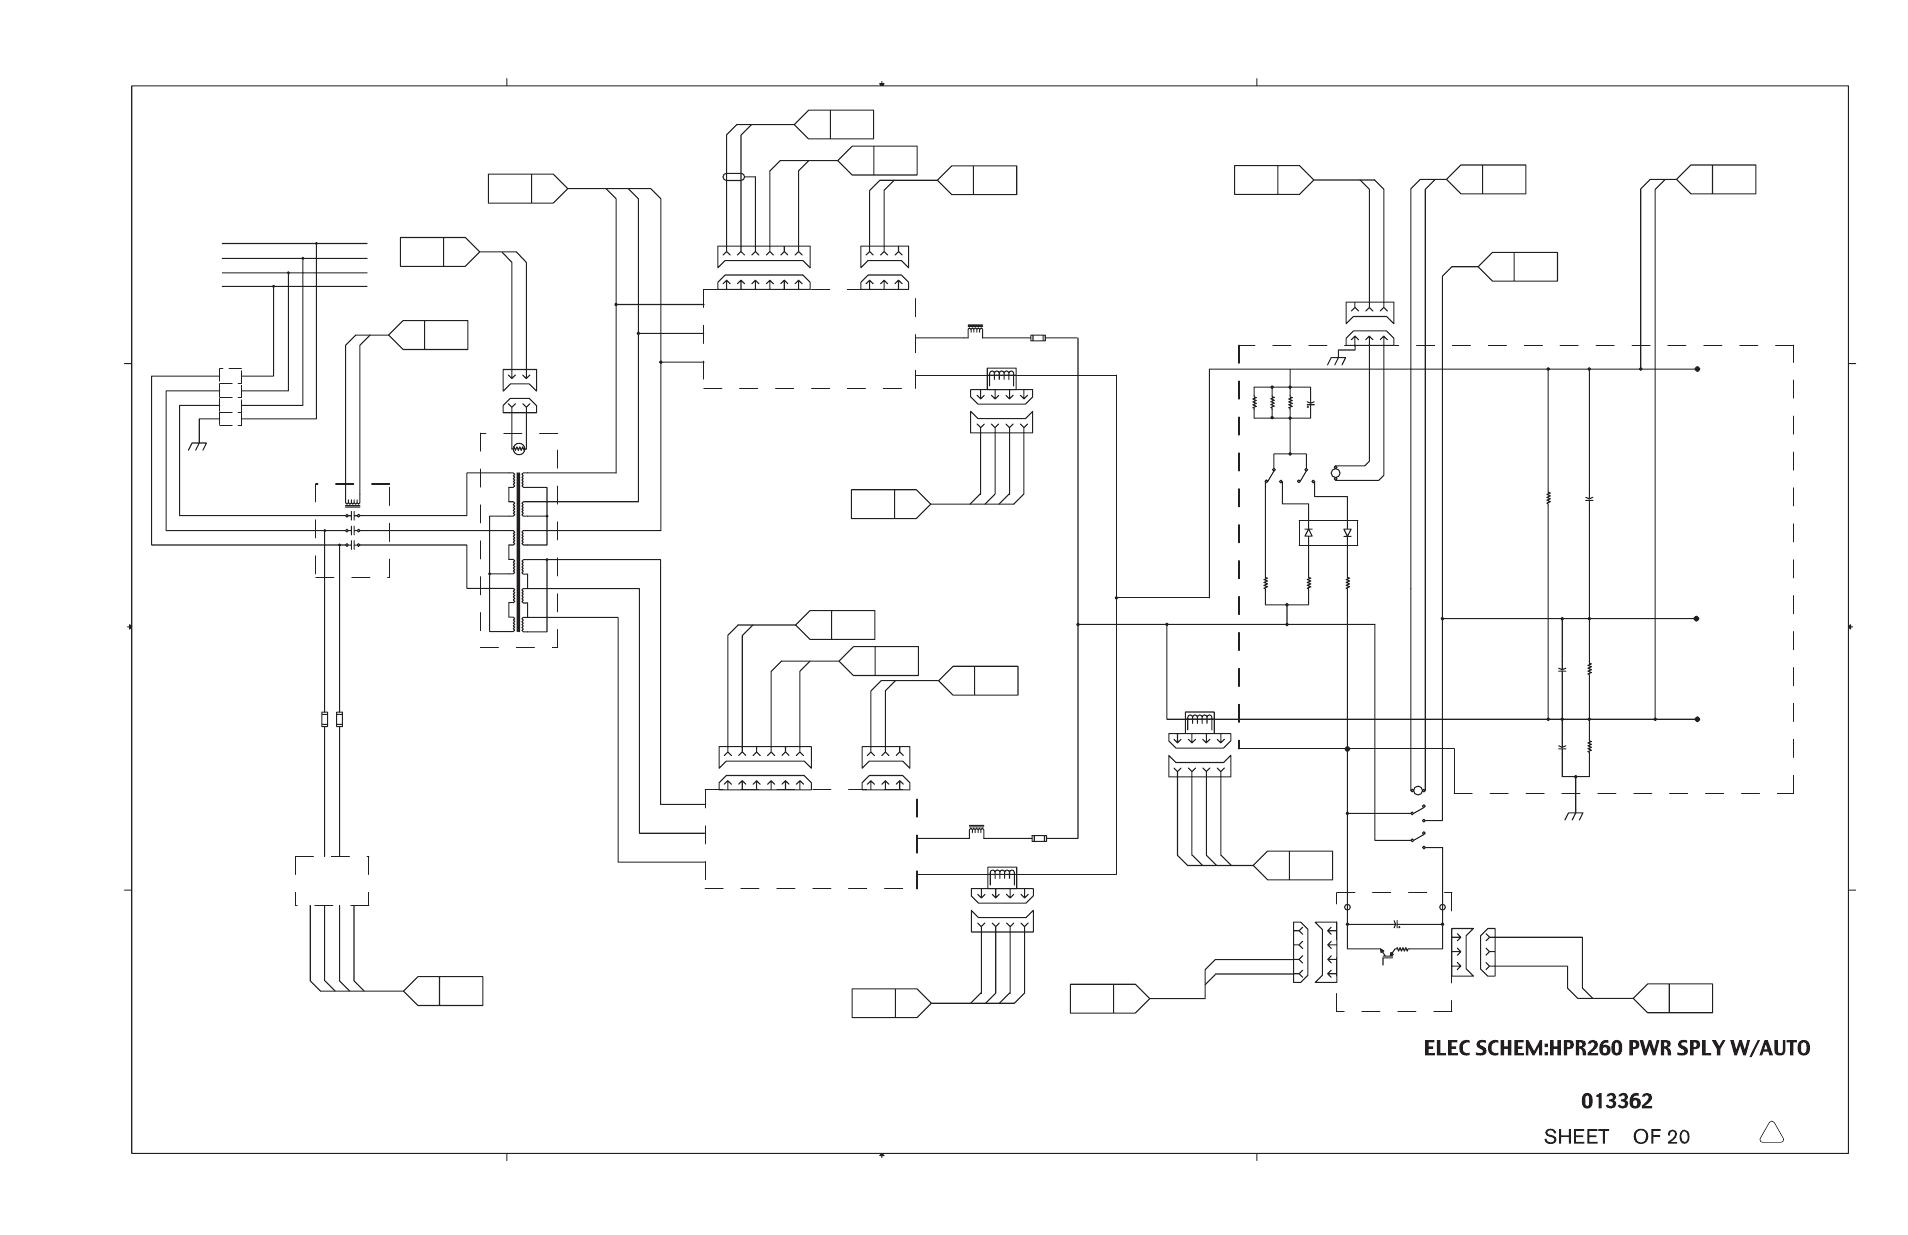 Hypertherm HPR260 Manual Gas Preventive Maintenance